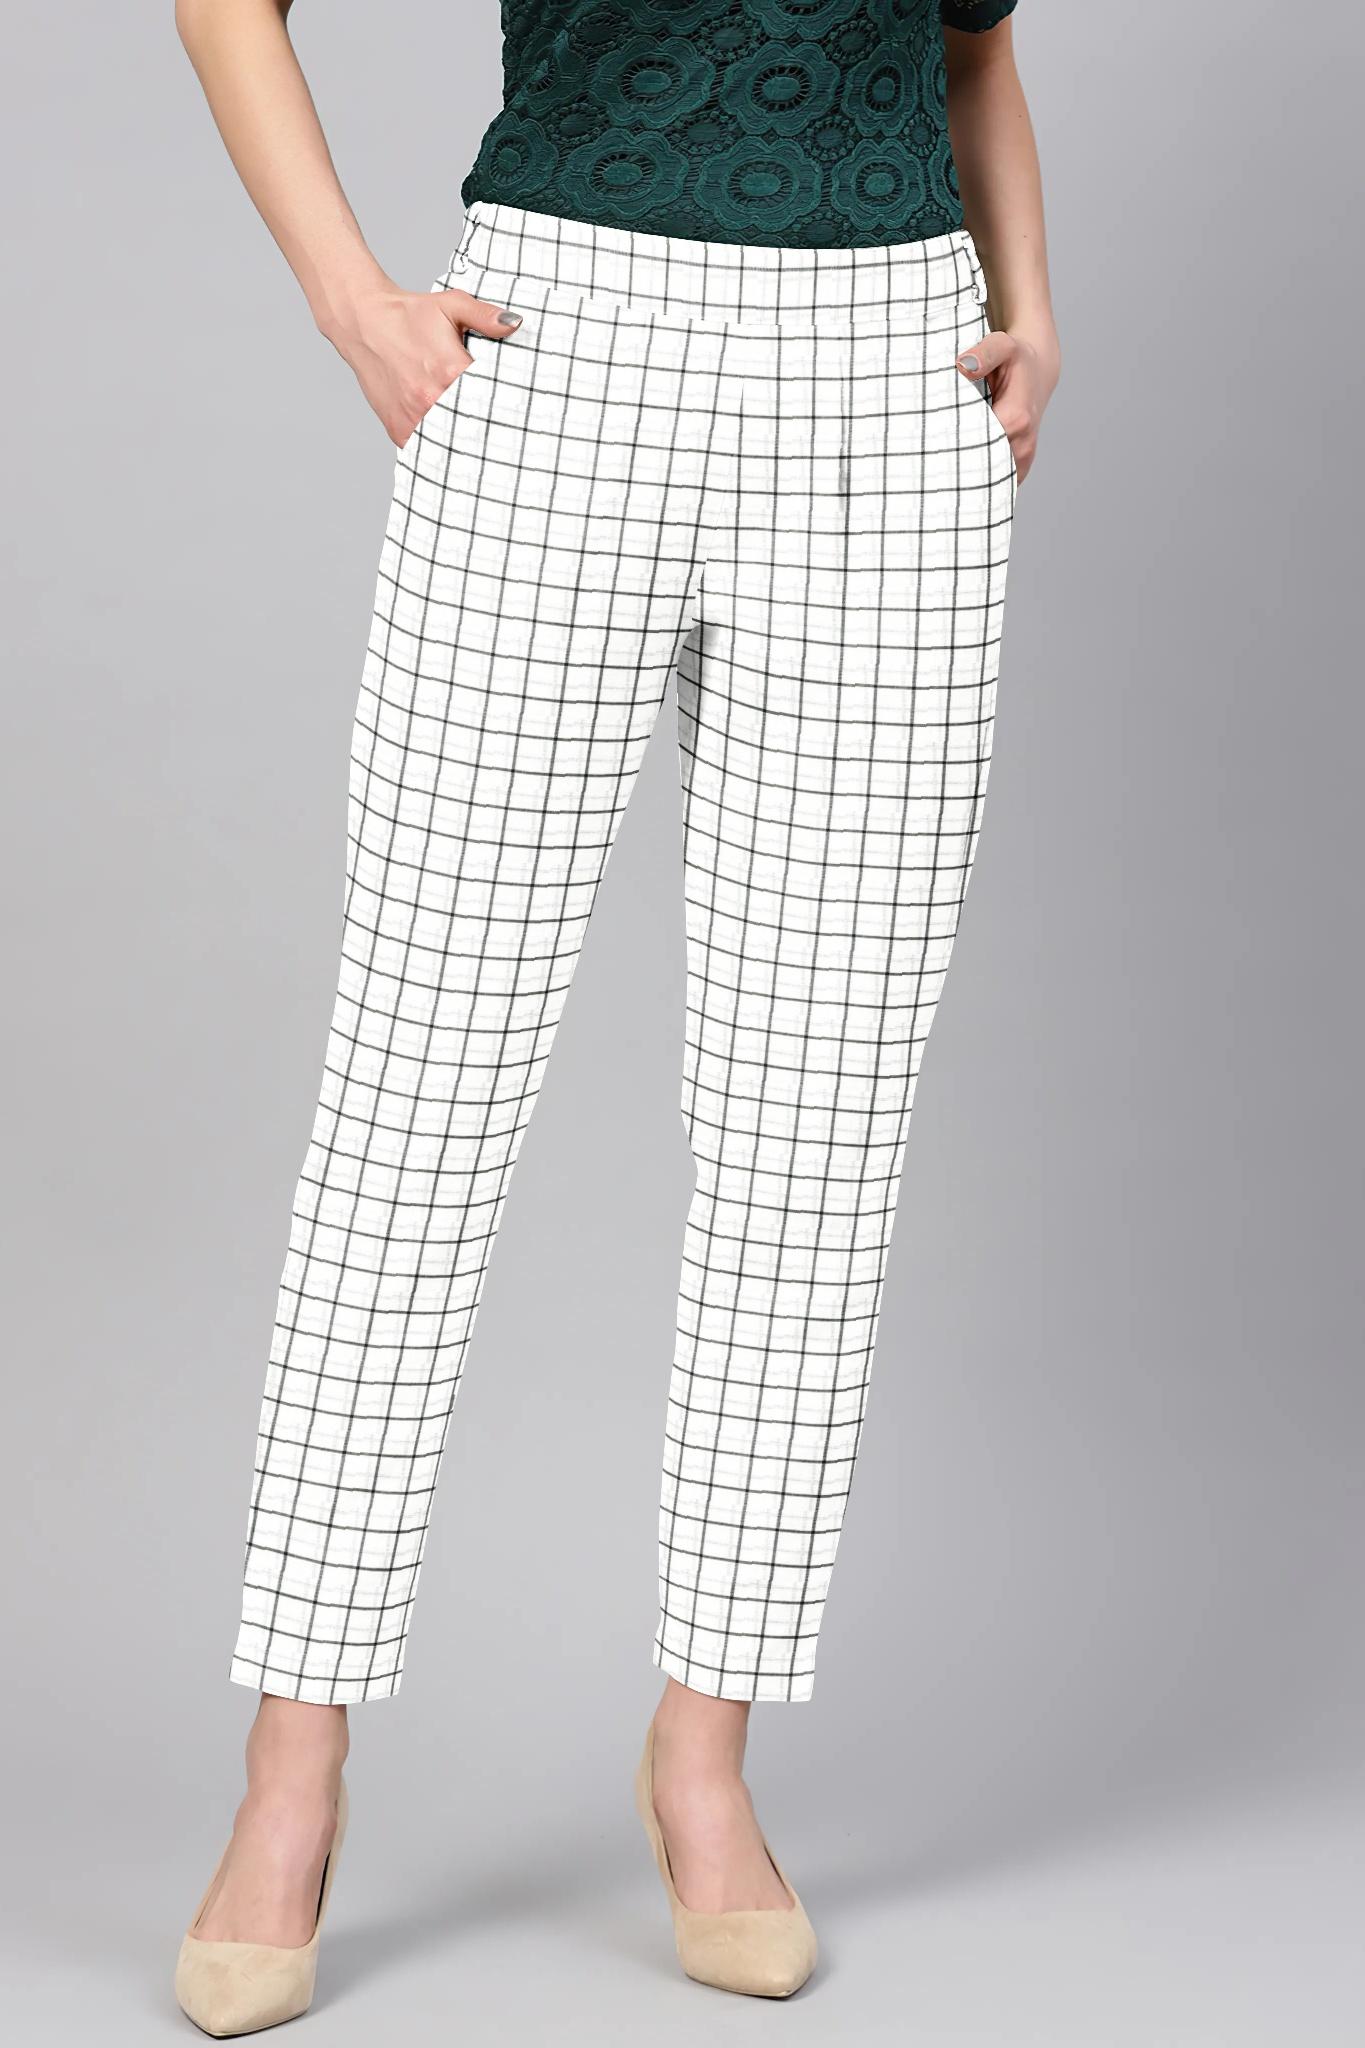 /home/customer/www/fabartcraft.com/public_html/uploadshttps://www.shopolics.com/uploads/images/medium/White-Black-Cotton-Check-Regular-Fit-Solid-Trouser-36092.jpg